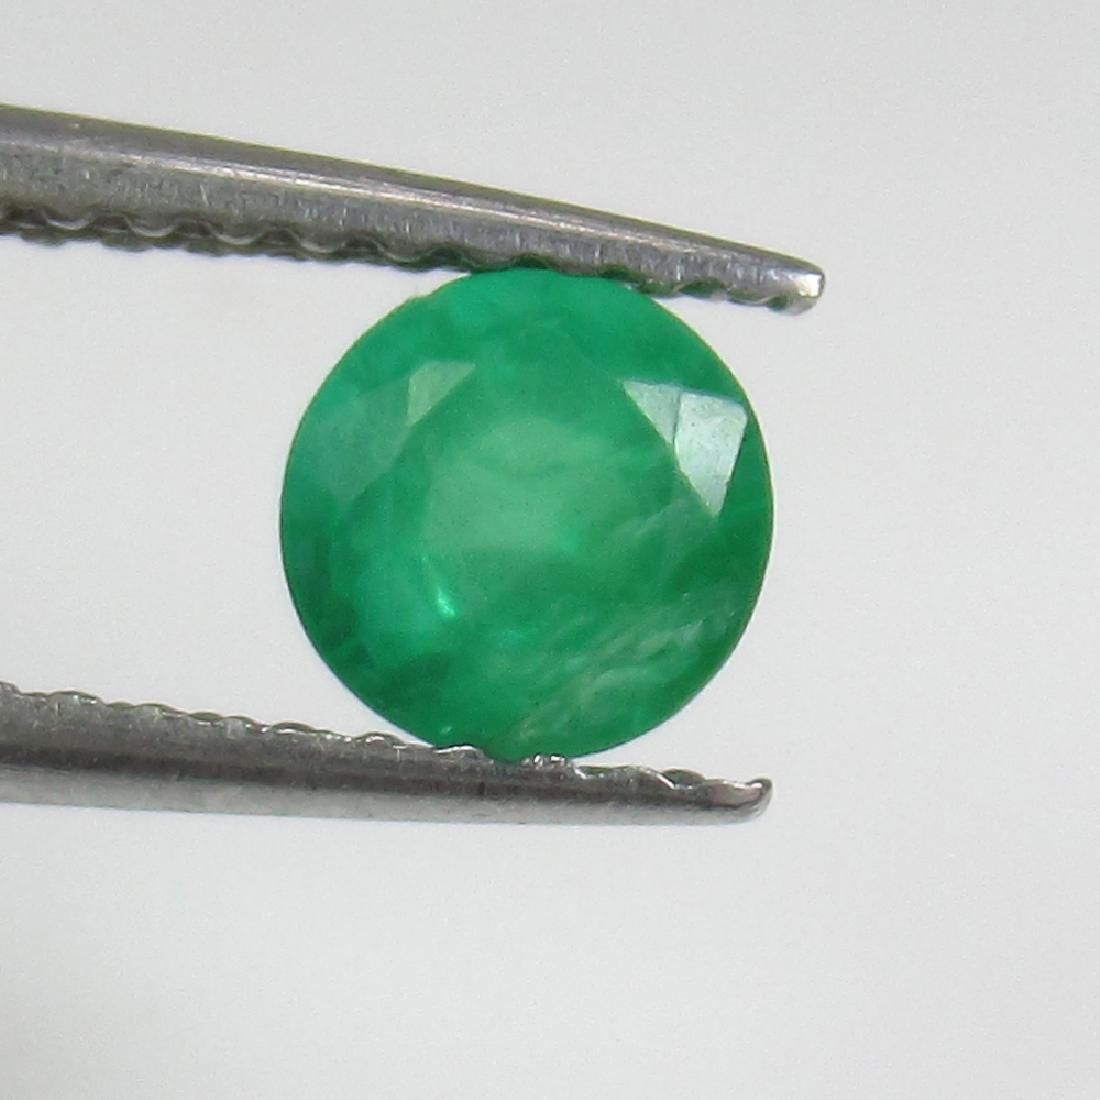 0.45 Ct Genuine Zambian Emerald 5 mm Round Cut